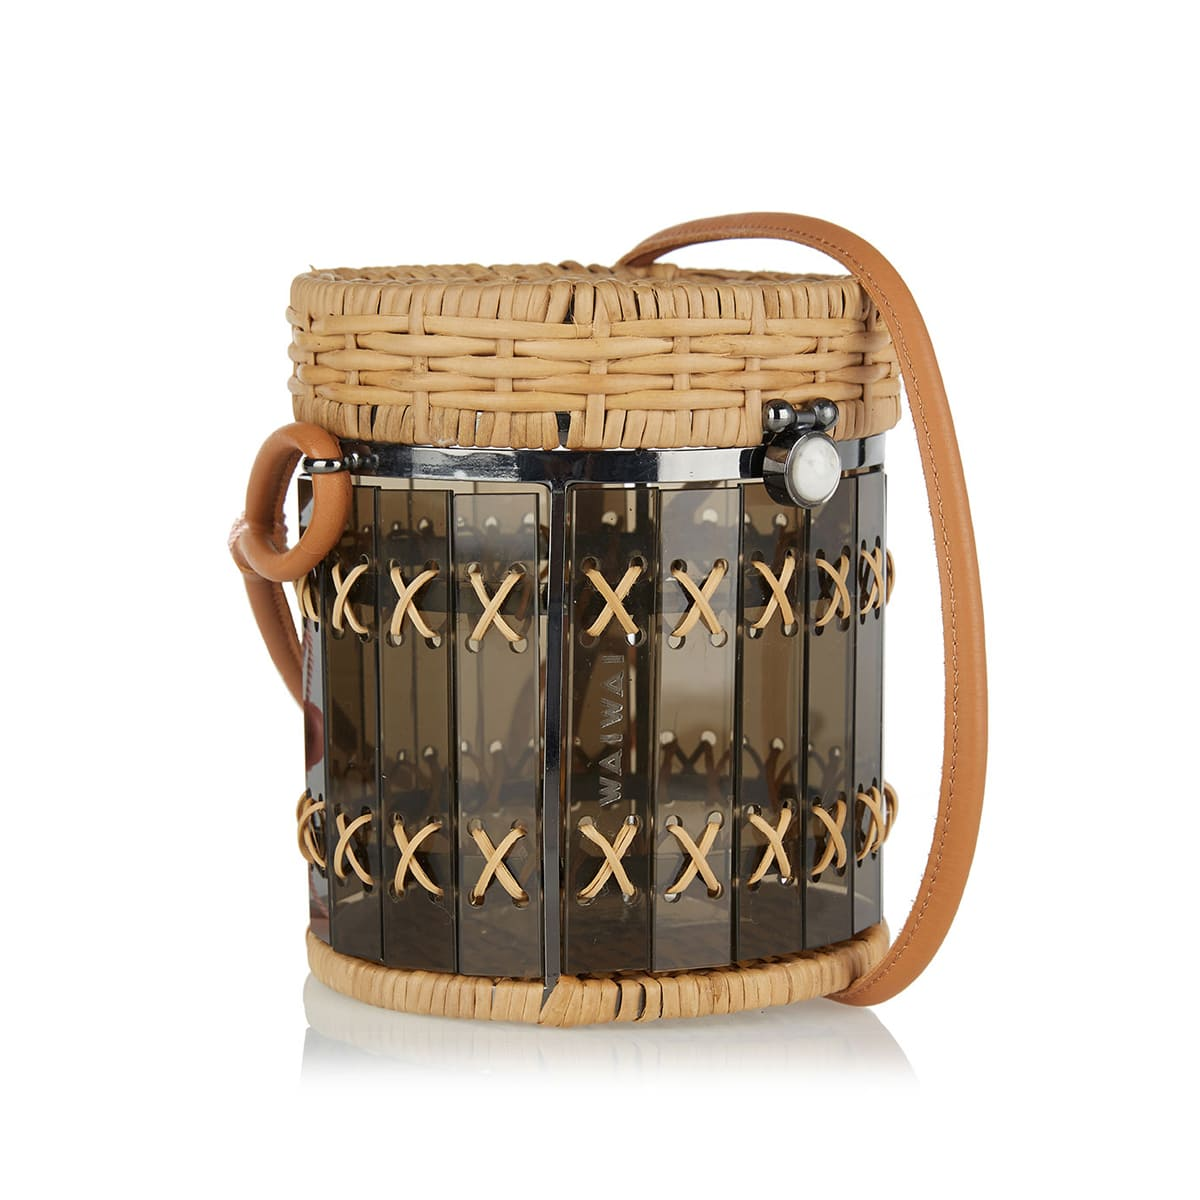 Bongo rattan and acetate bag